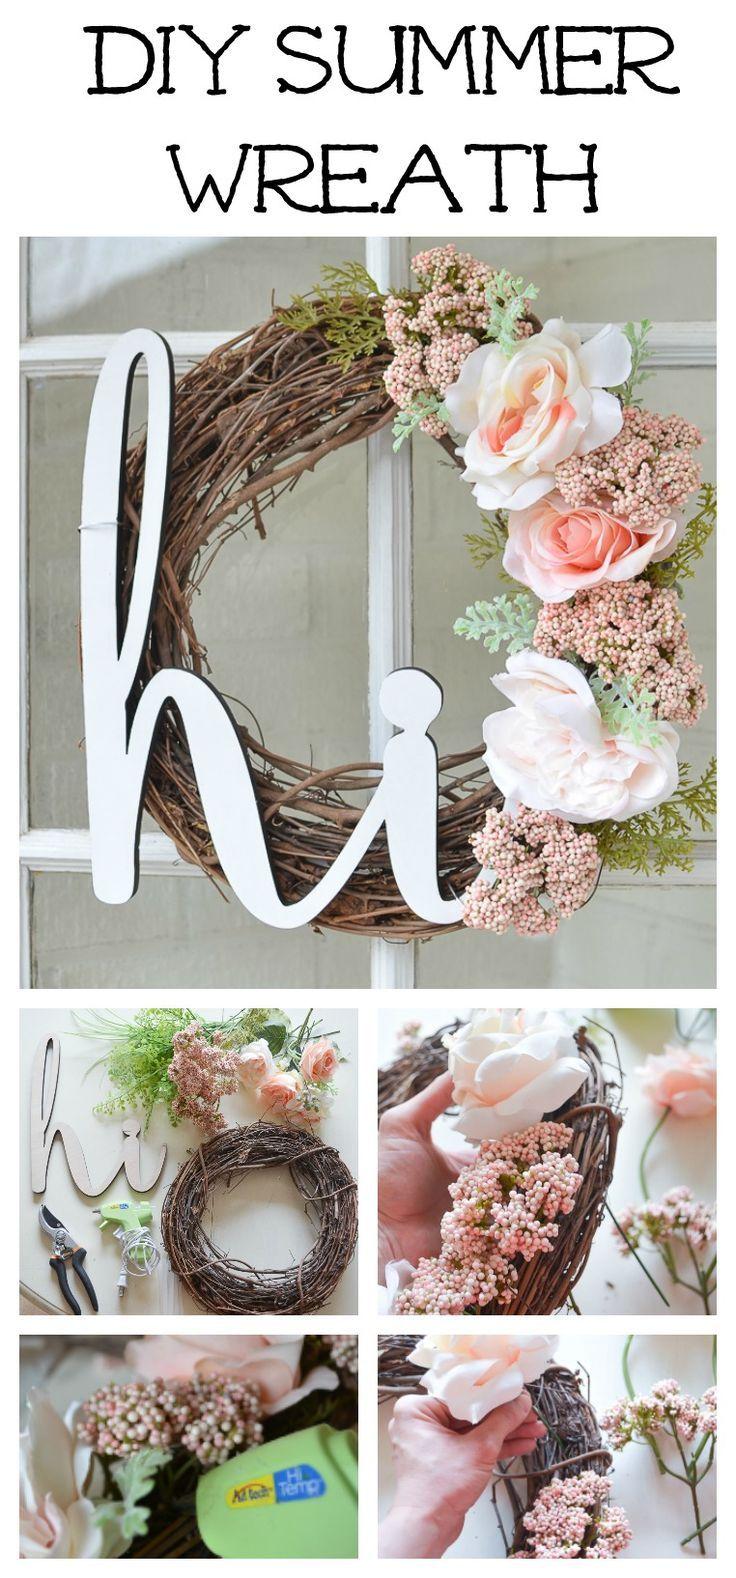 373 best door wreaths diy images on pinterest bricolage for Diy summer wreath